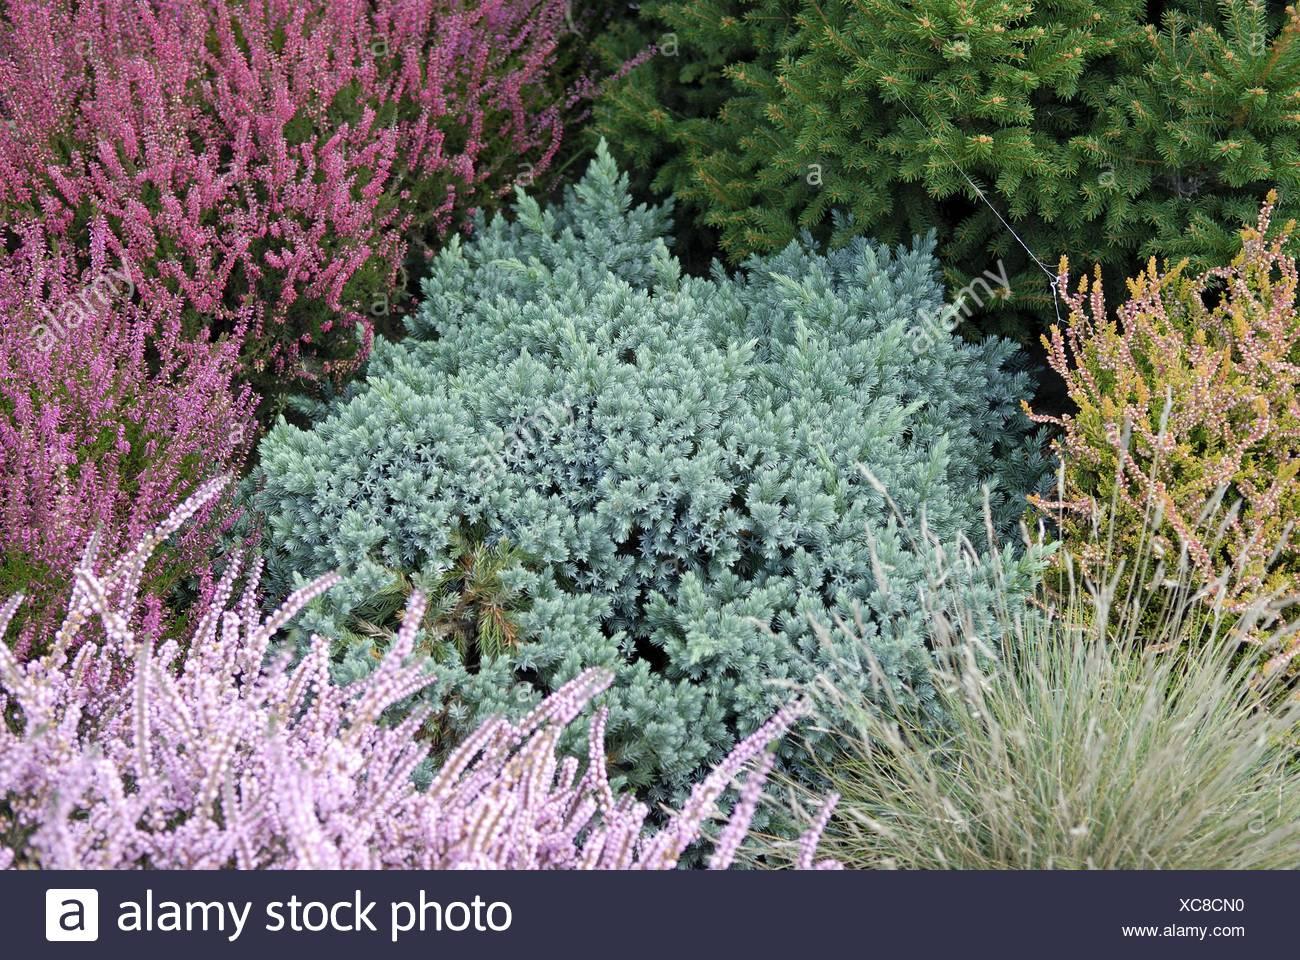 Blue Star Juniper (Juniperus squamata 'Blue Star', Juniperus squamata Blue Star), cultivar Blue Star in a garden with Calluna - Stock Image